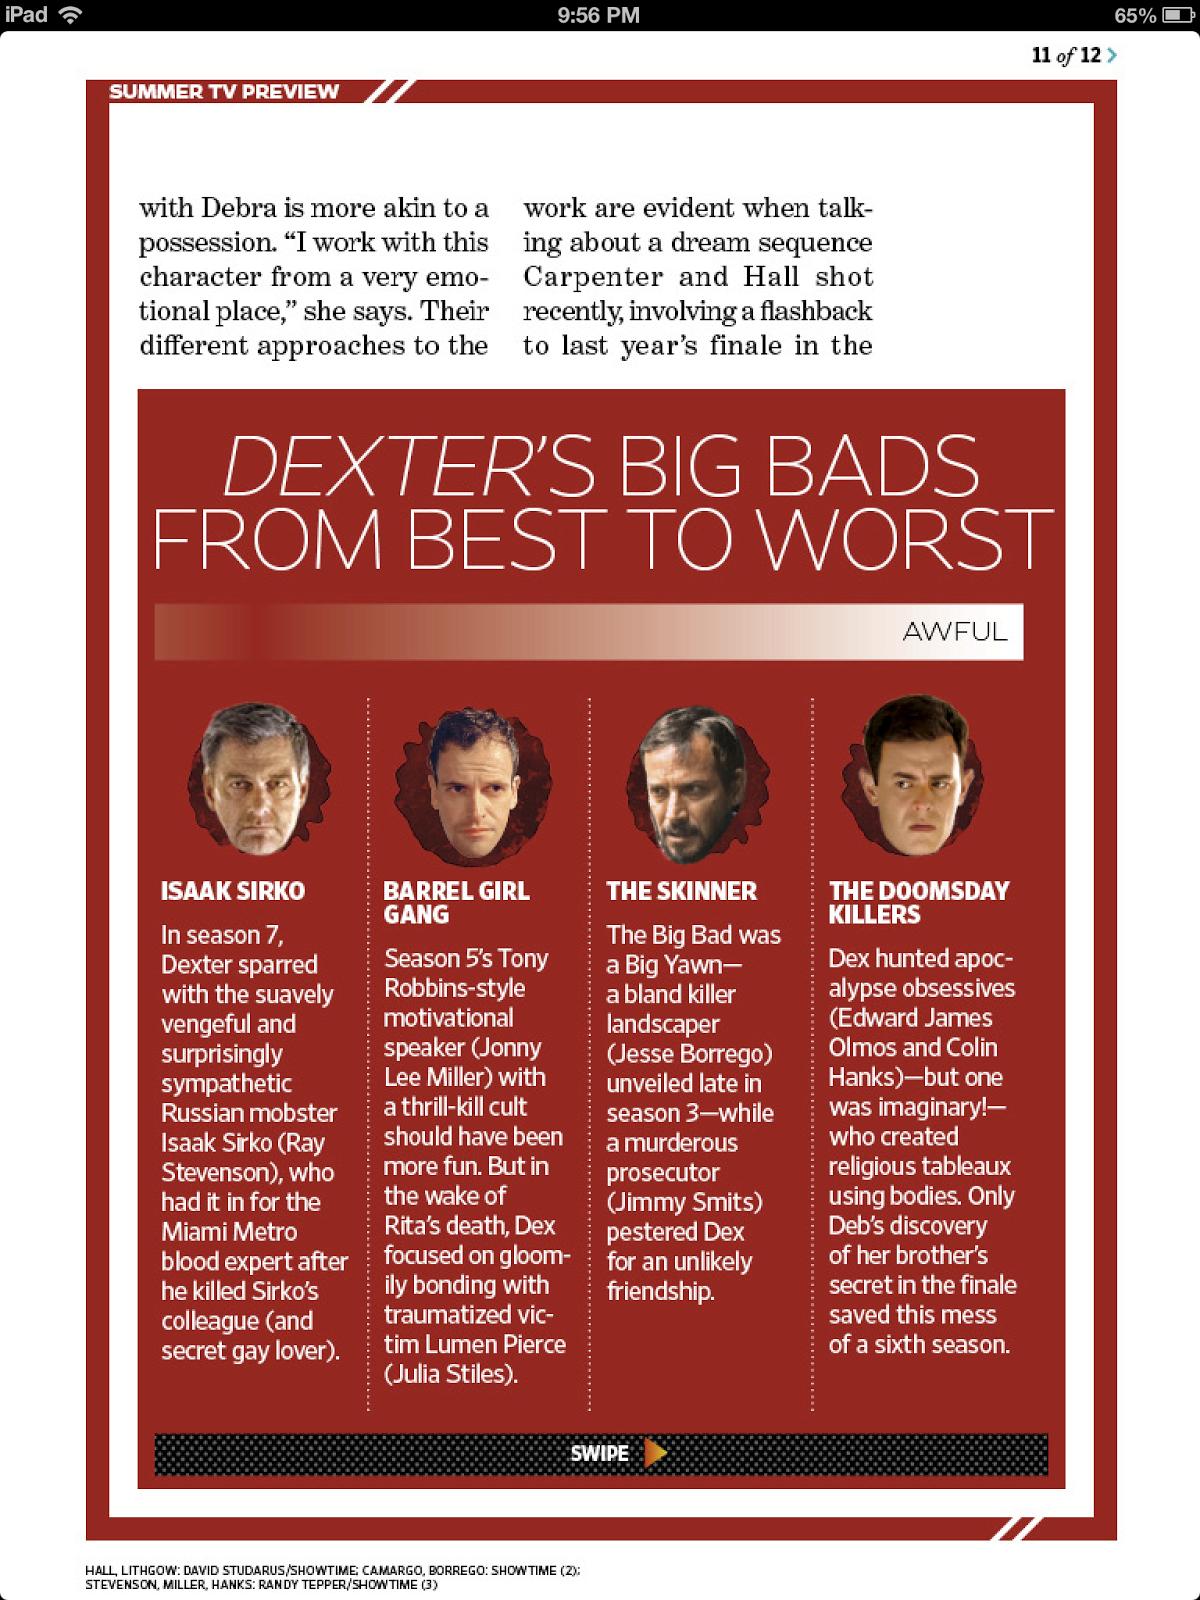 Dexter - Season 8 - EW Magazine Scans